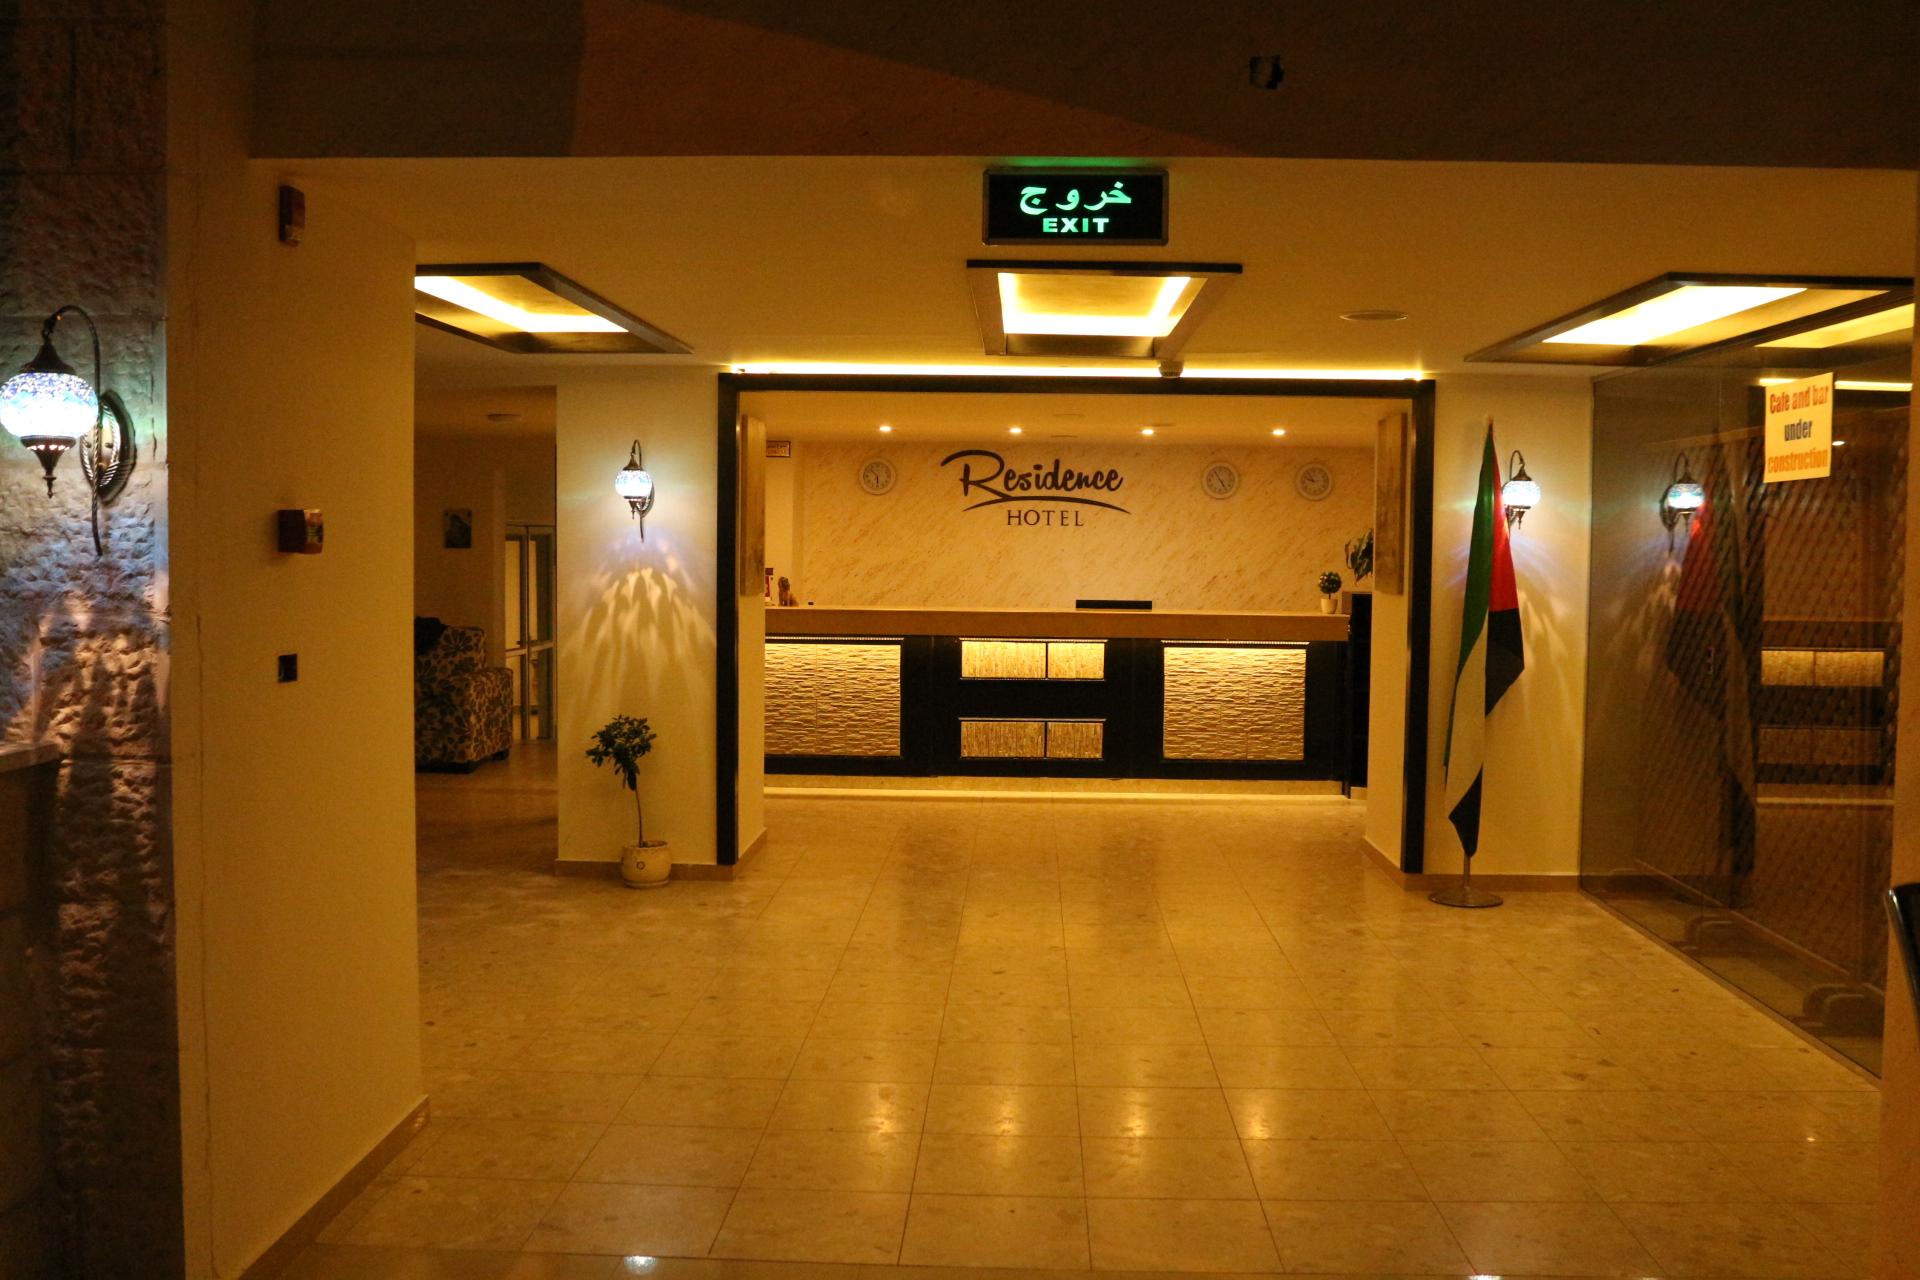 Residence Hotel_169270585